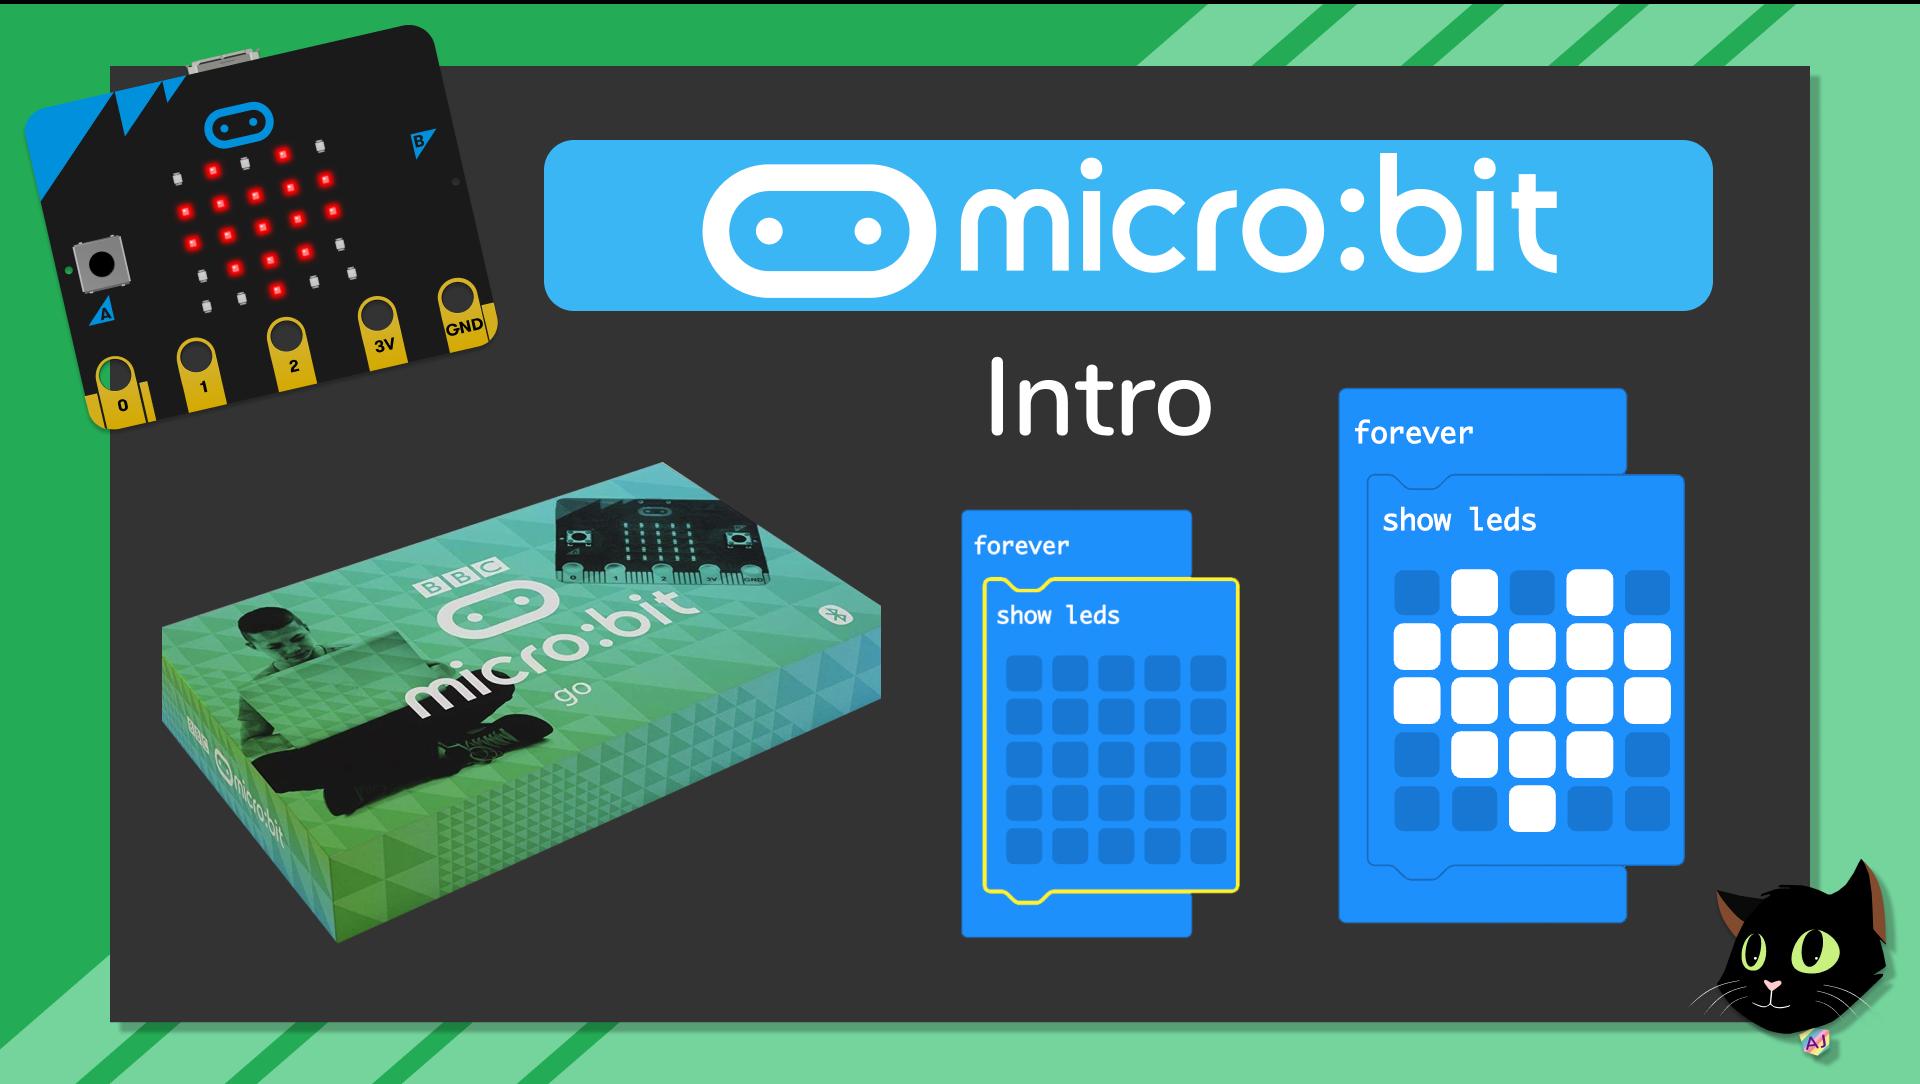 Microbit Intro